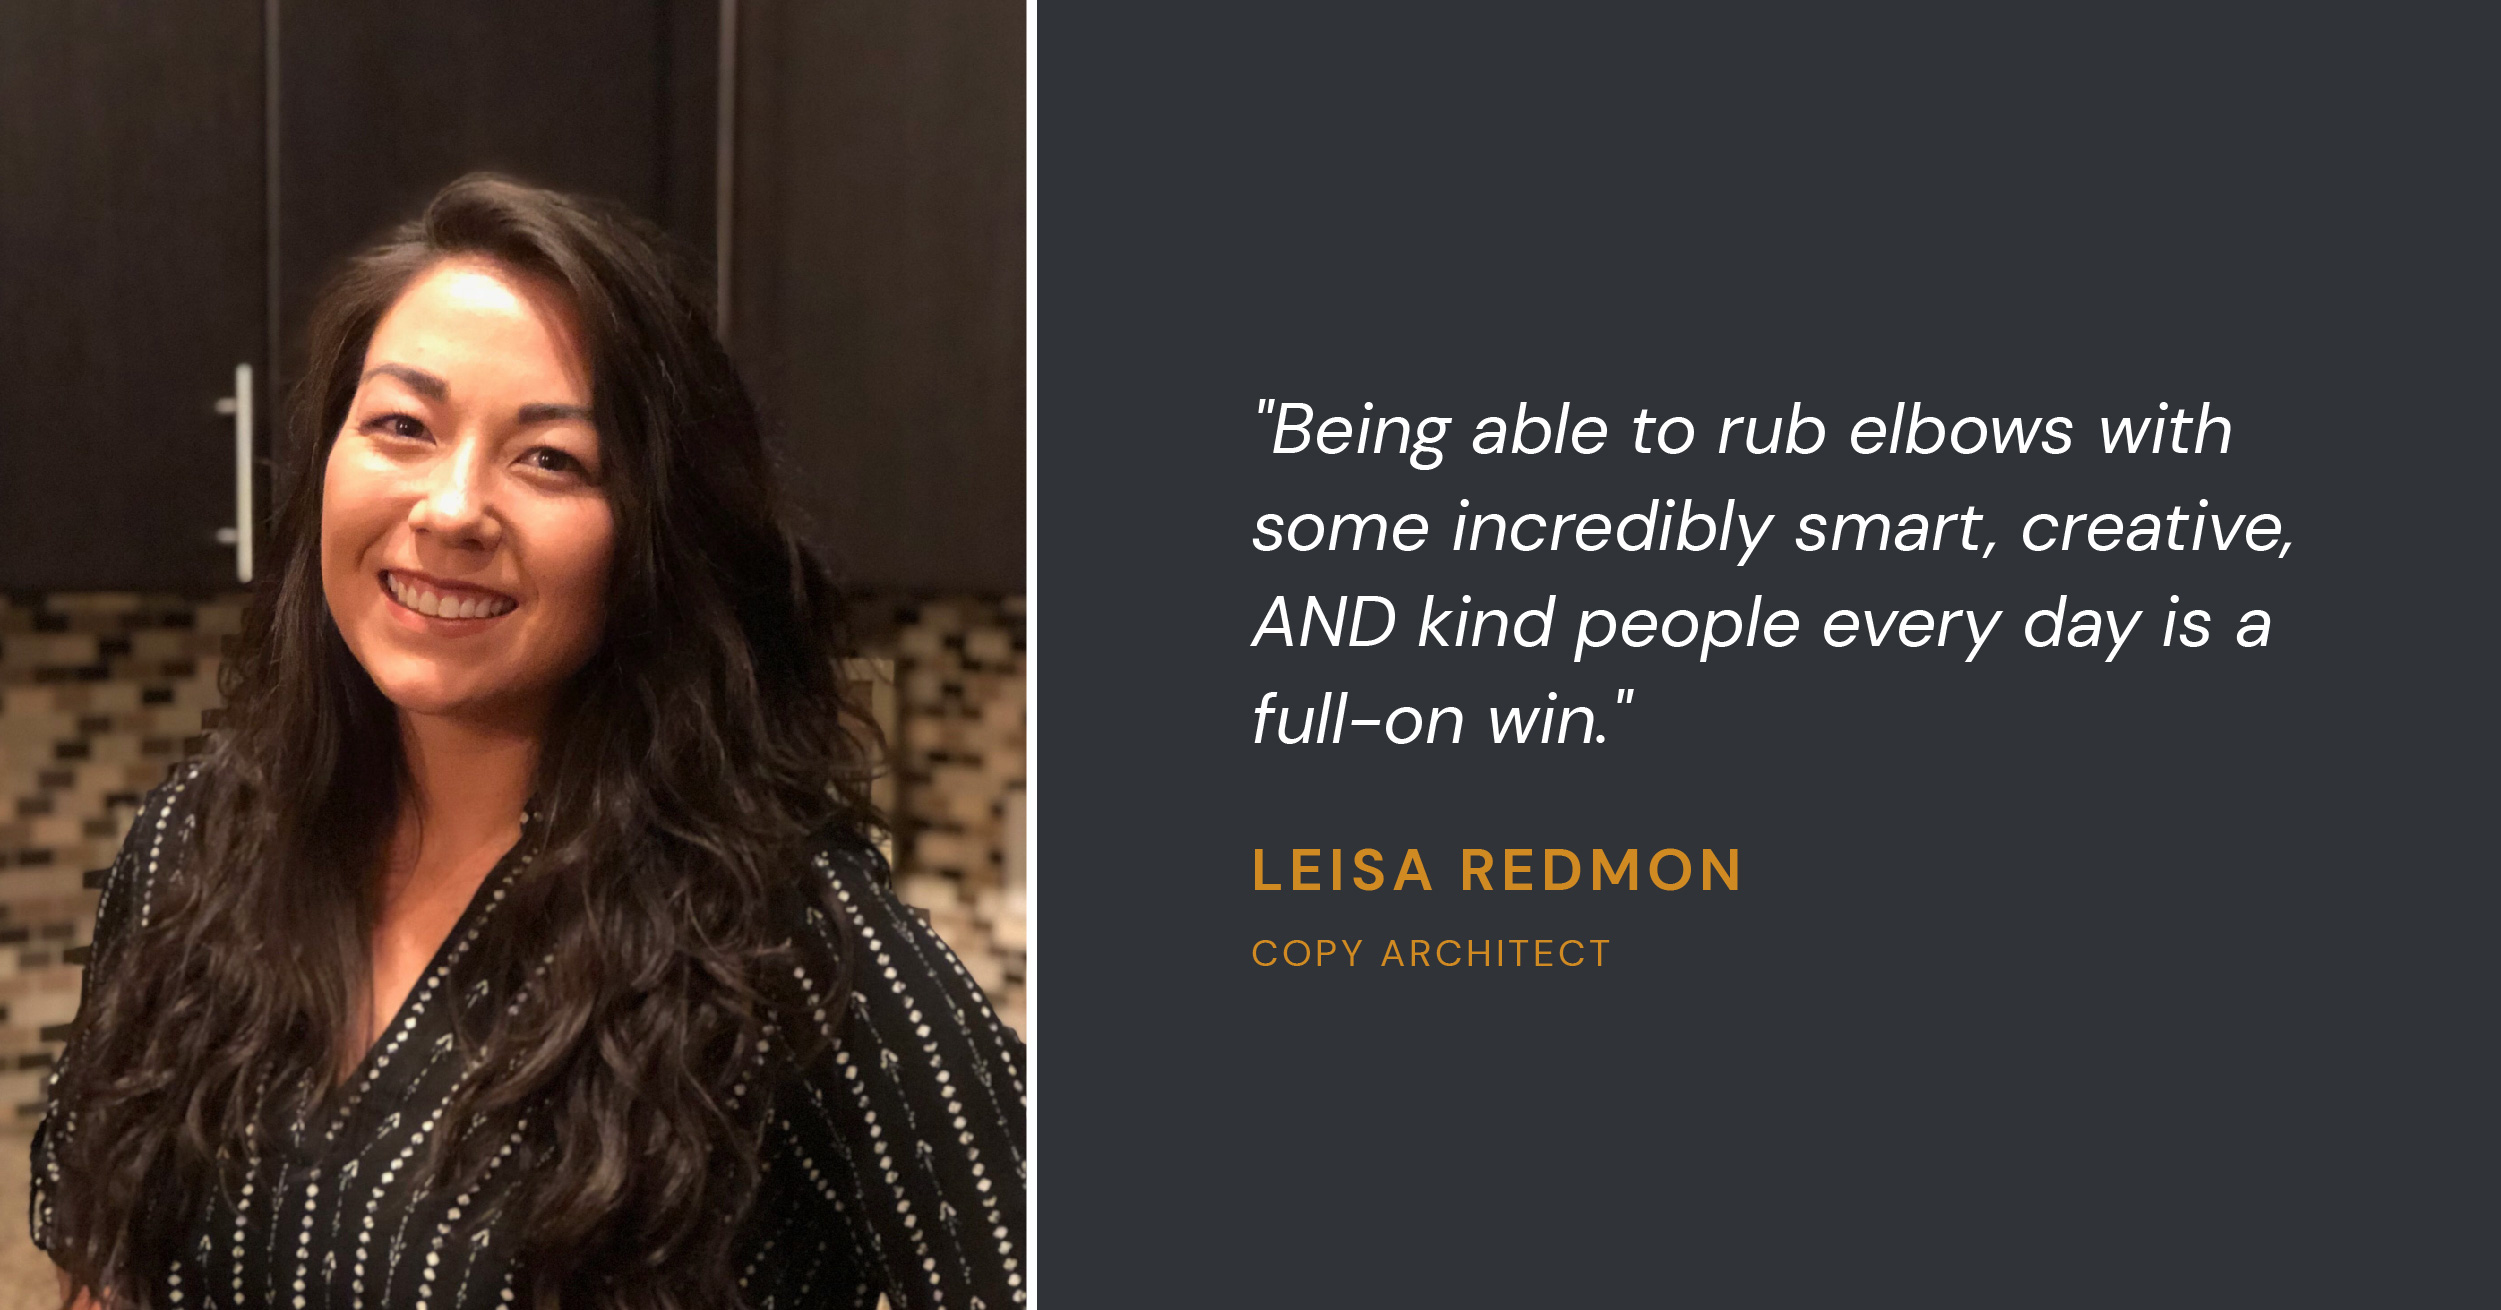 Leisa-Redmon-Copy-Architect